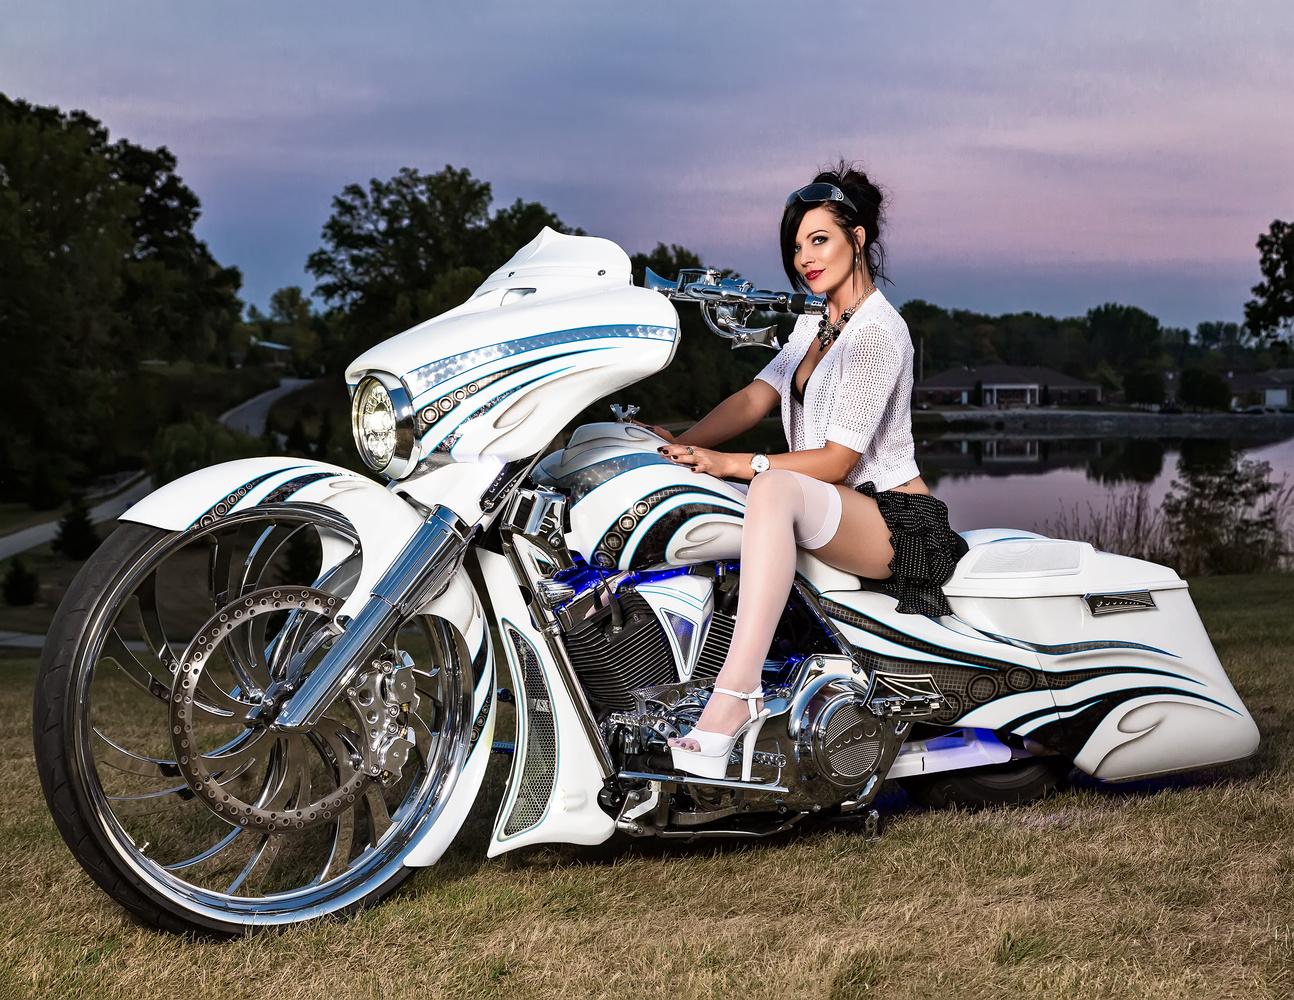 Harley Dream by David Lawrence